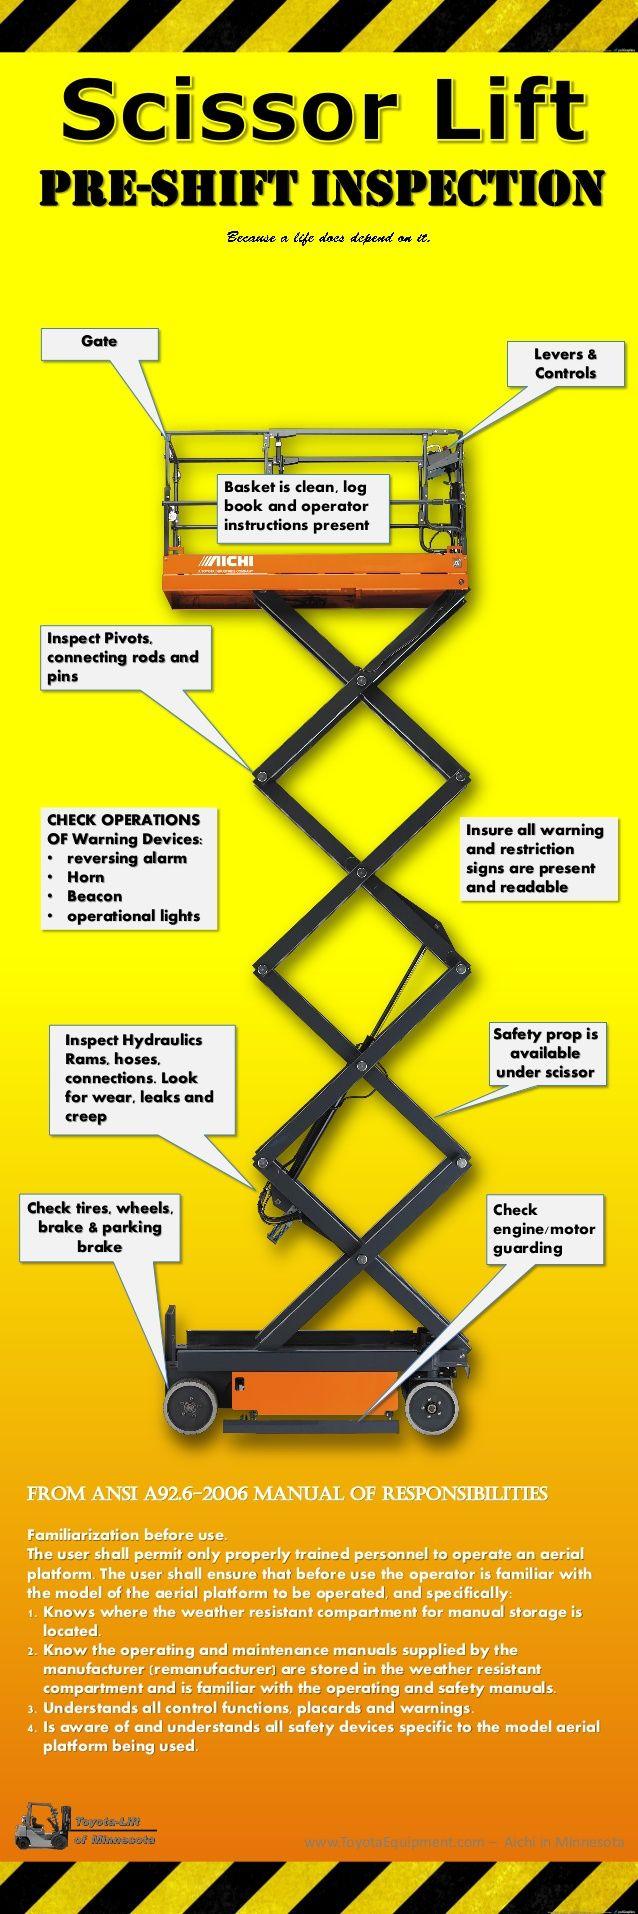 Scissor Lift Inspection Infographic Thesafetyandriskspotlight Scissors Wire Diagram